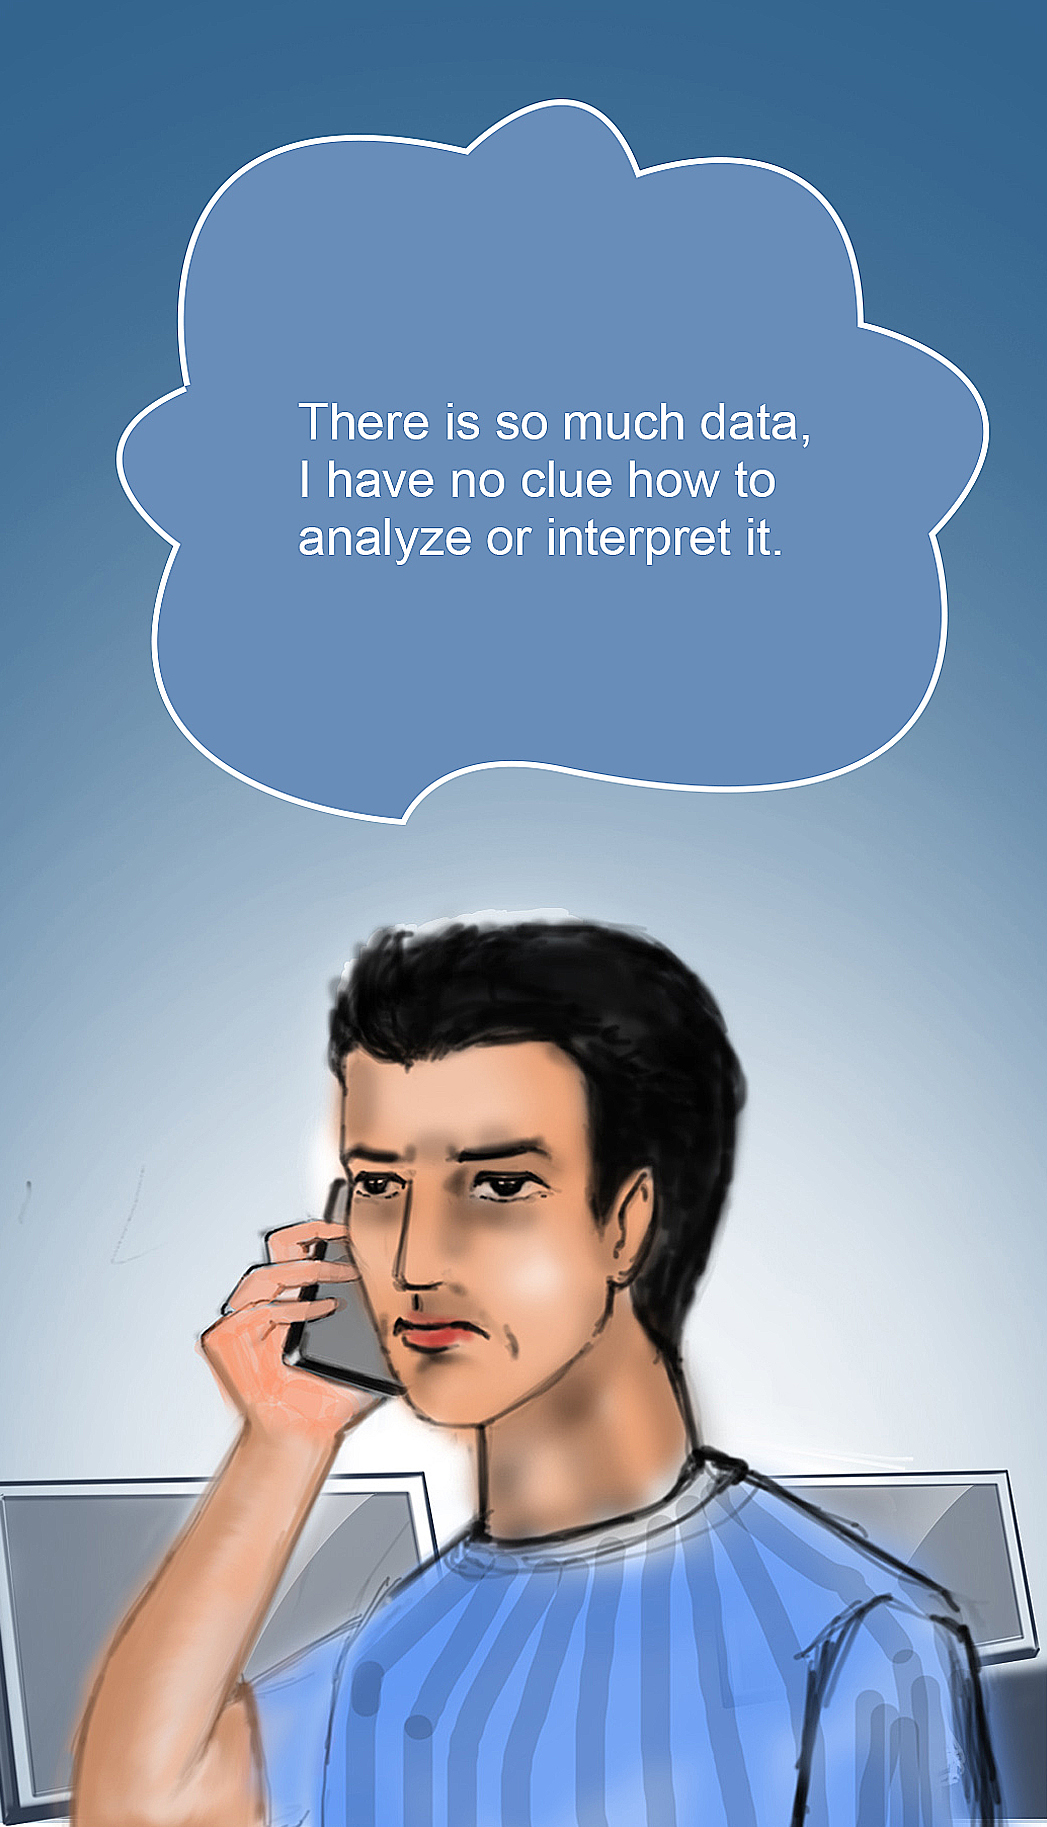 Statswork storyboard